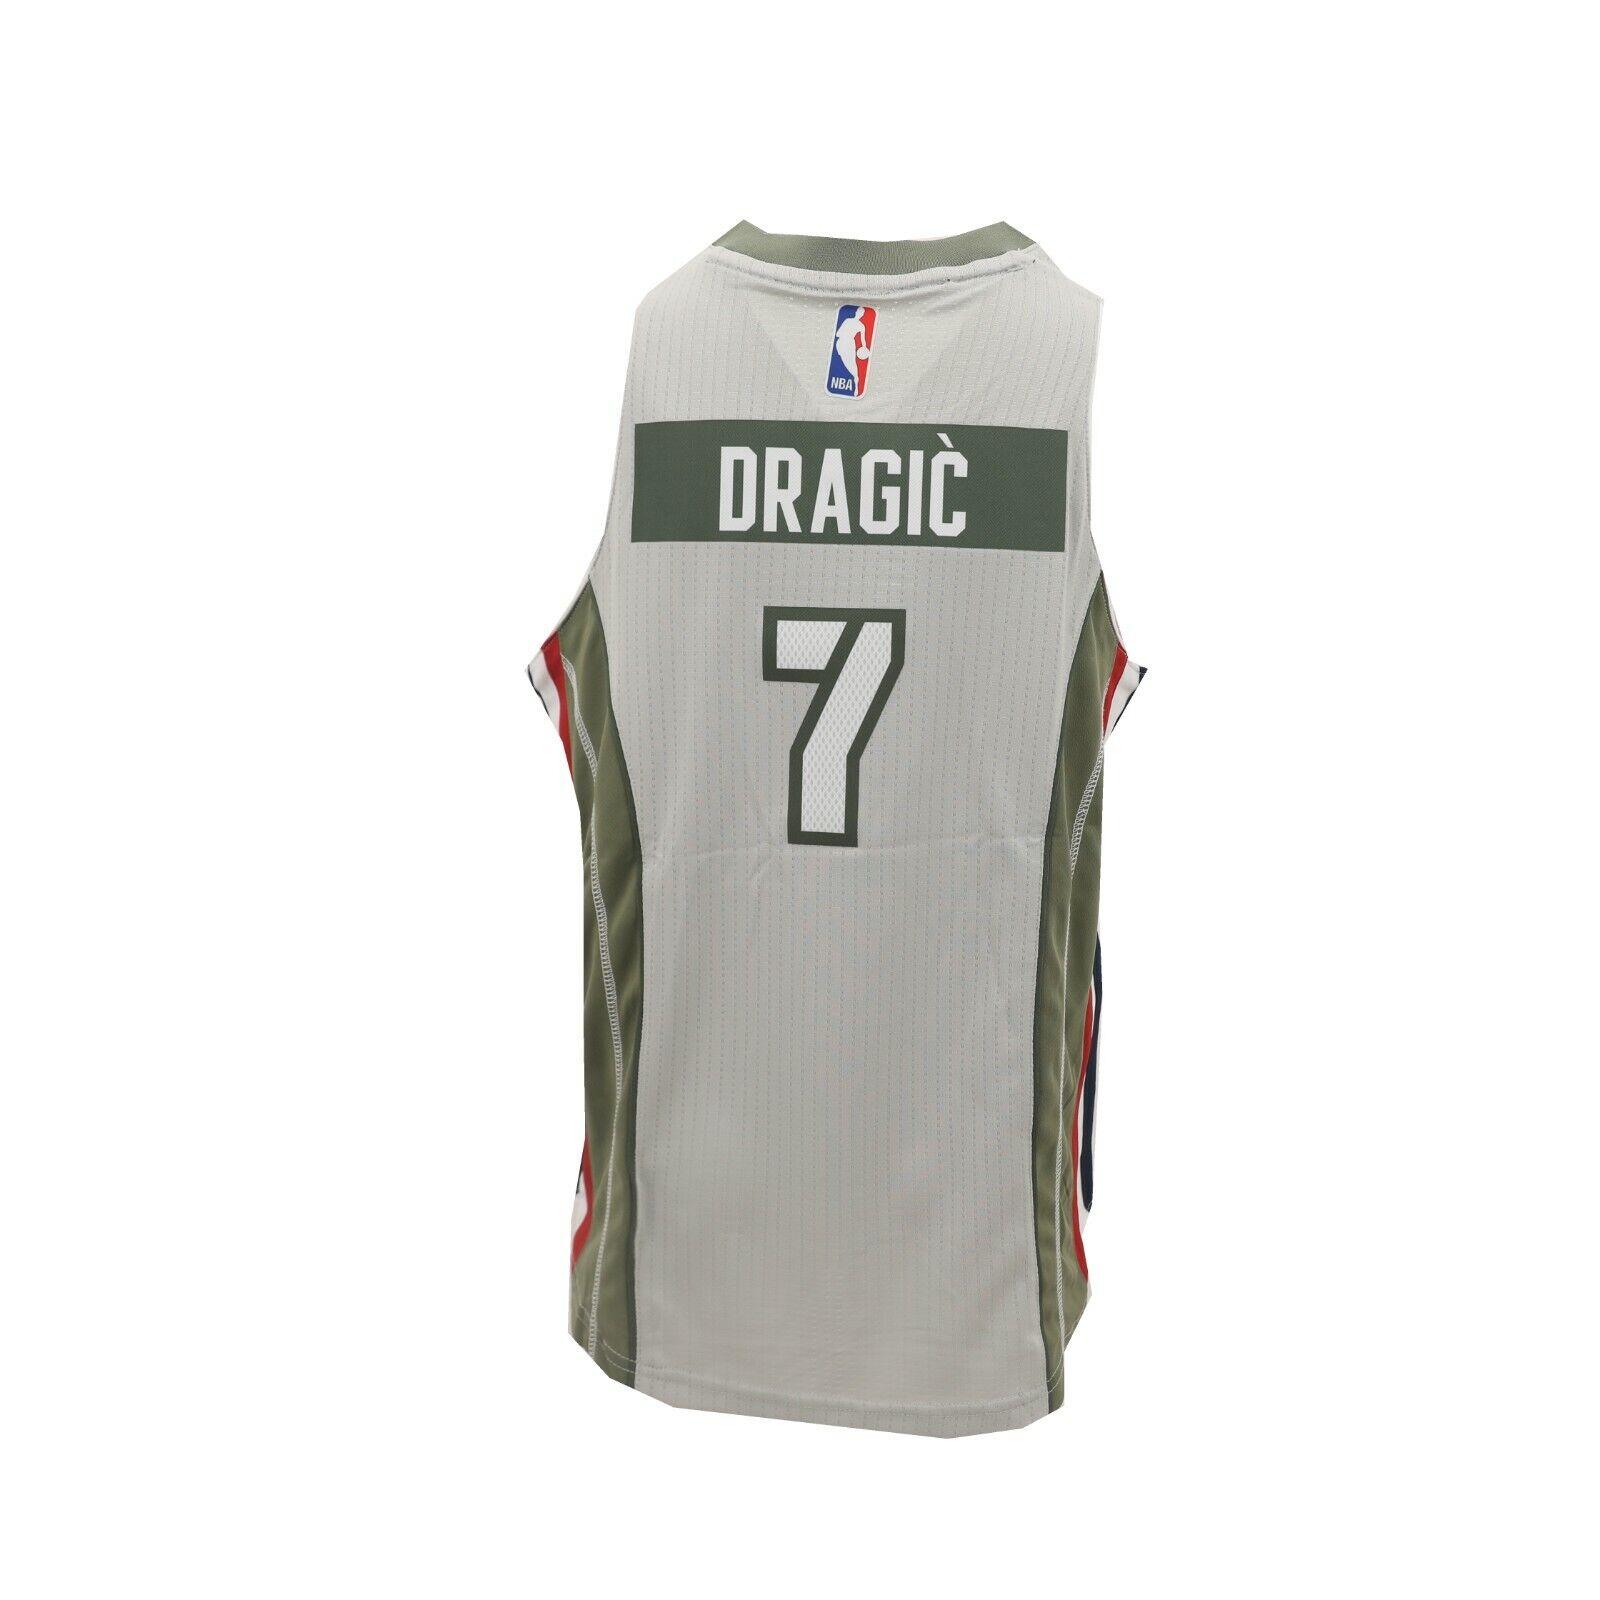 new arrival e1671 20d1e Details about Miami Heat NBA Adidas Kids Youth Size Goran Dragic Home  Strong Swingman Jersey